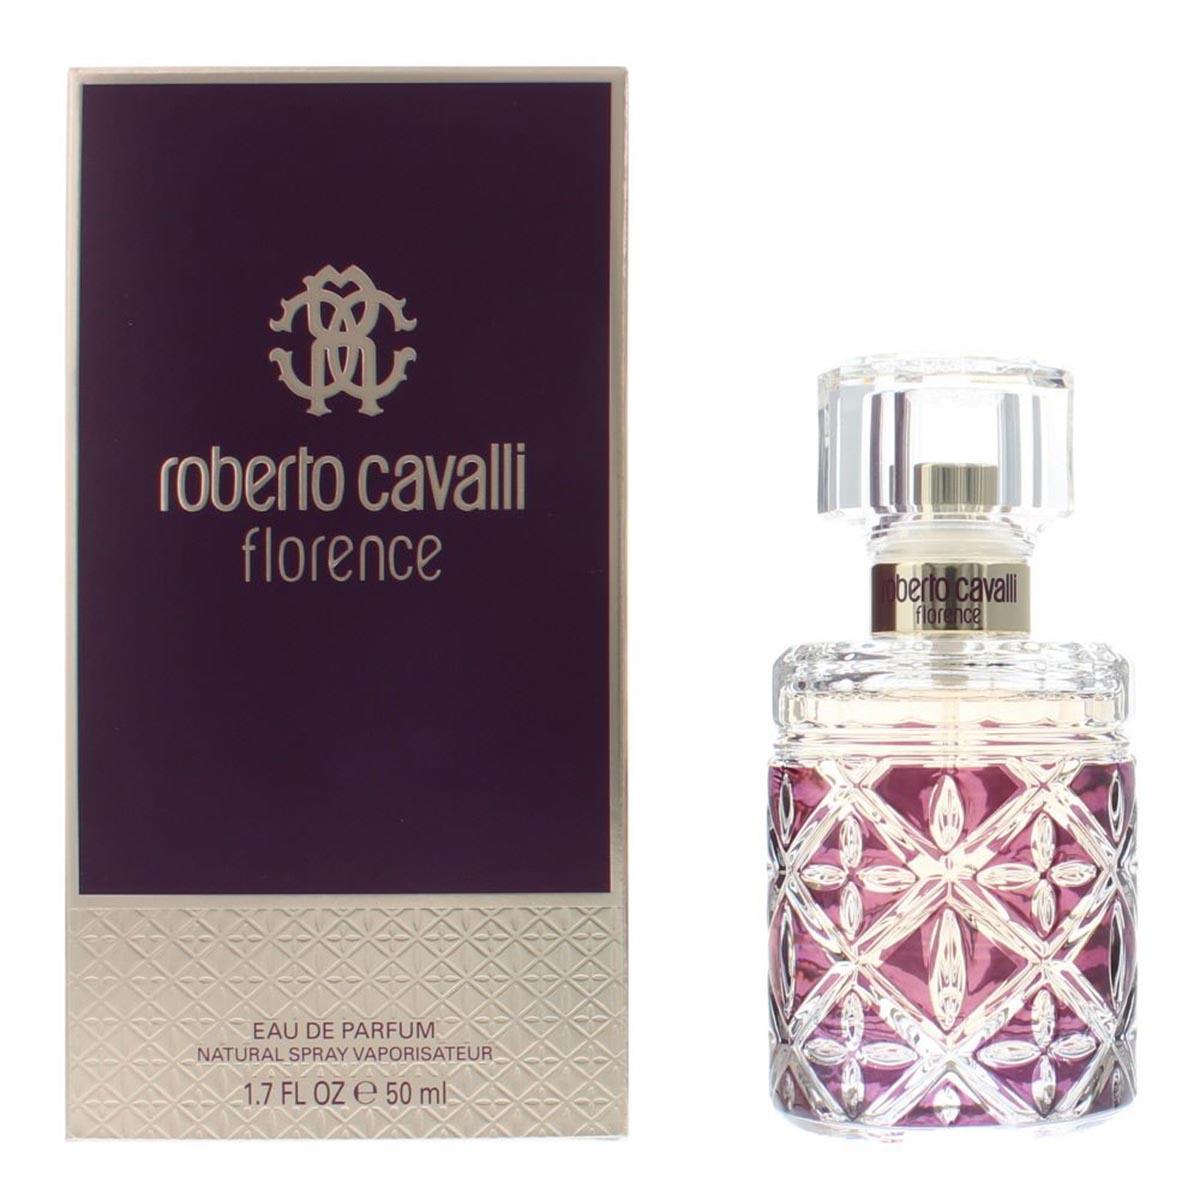 Roberto cavalli florence eau de parfum 50ml vaporizador